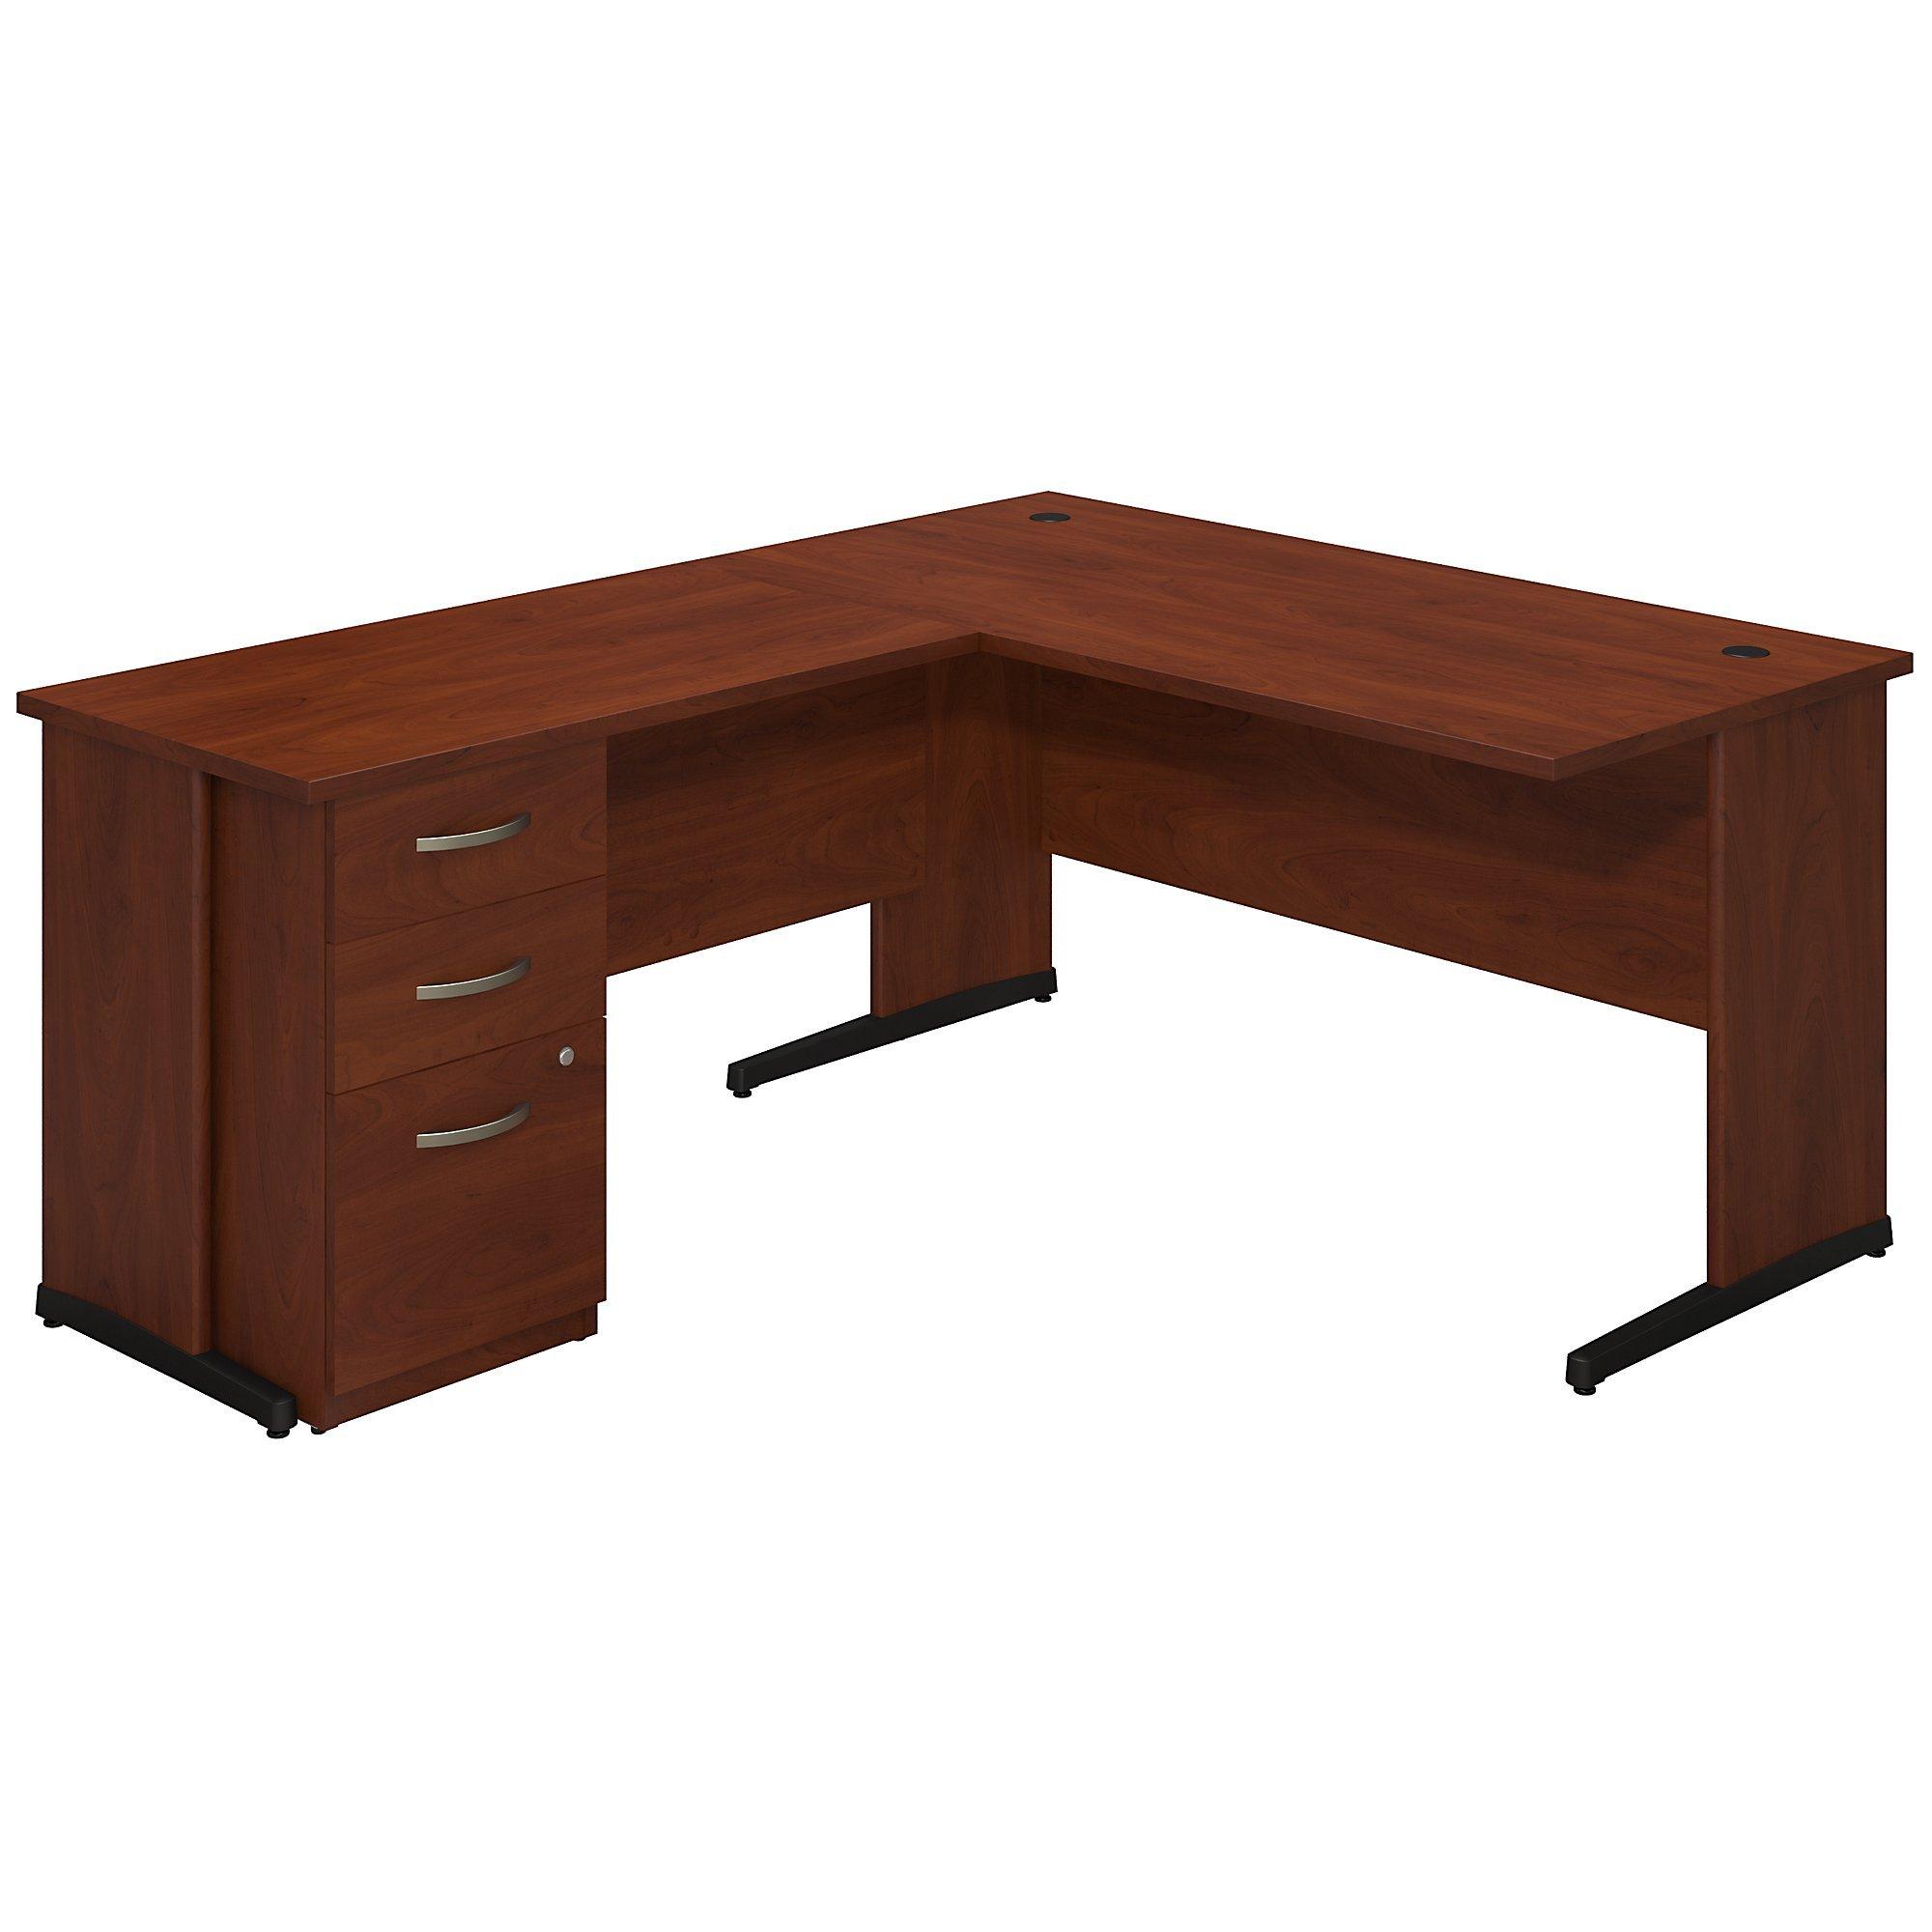 Bush Business Furniture Series C Elite 60W x 30D C Leg L Shaped Desk with Storage in Hansen Cherry by Bush Business Furniture